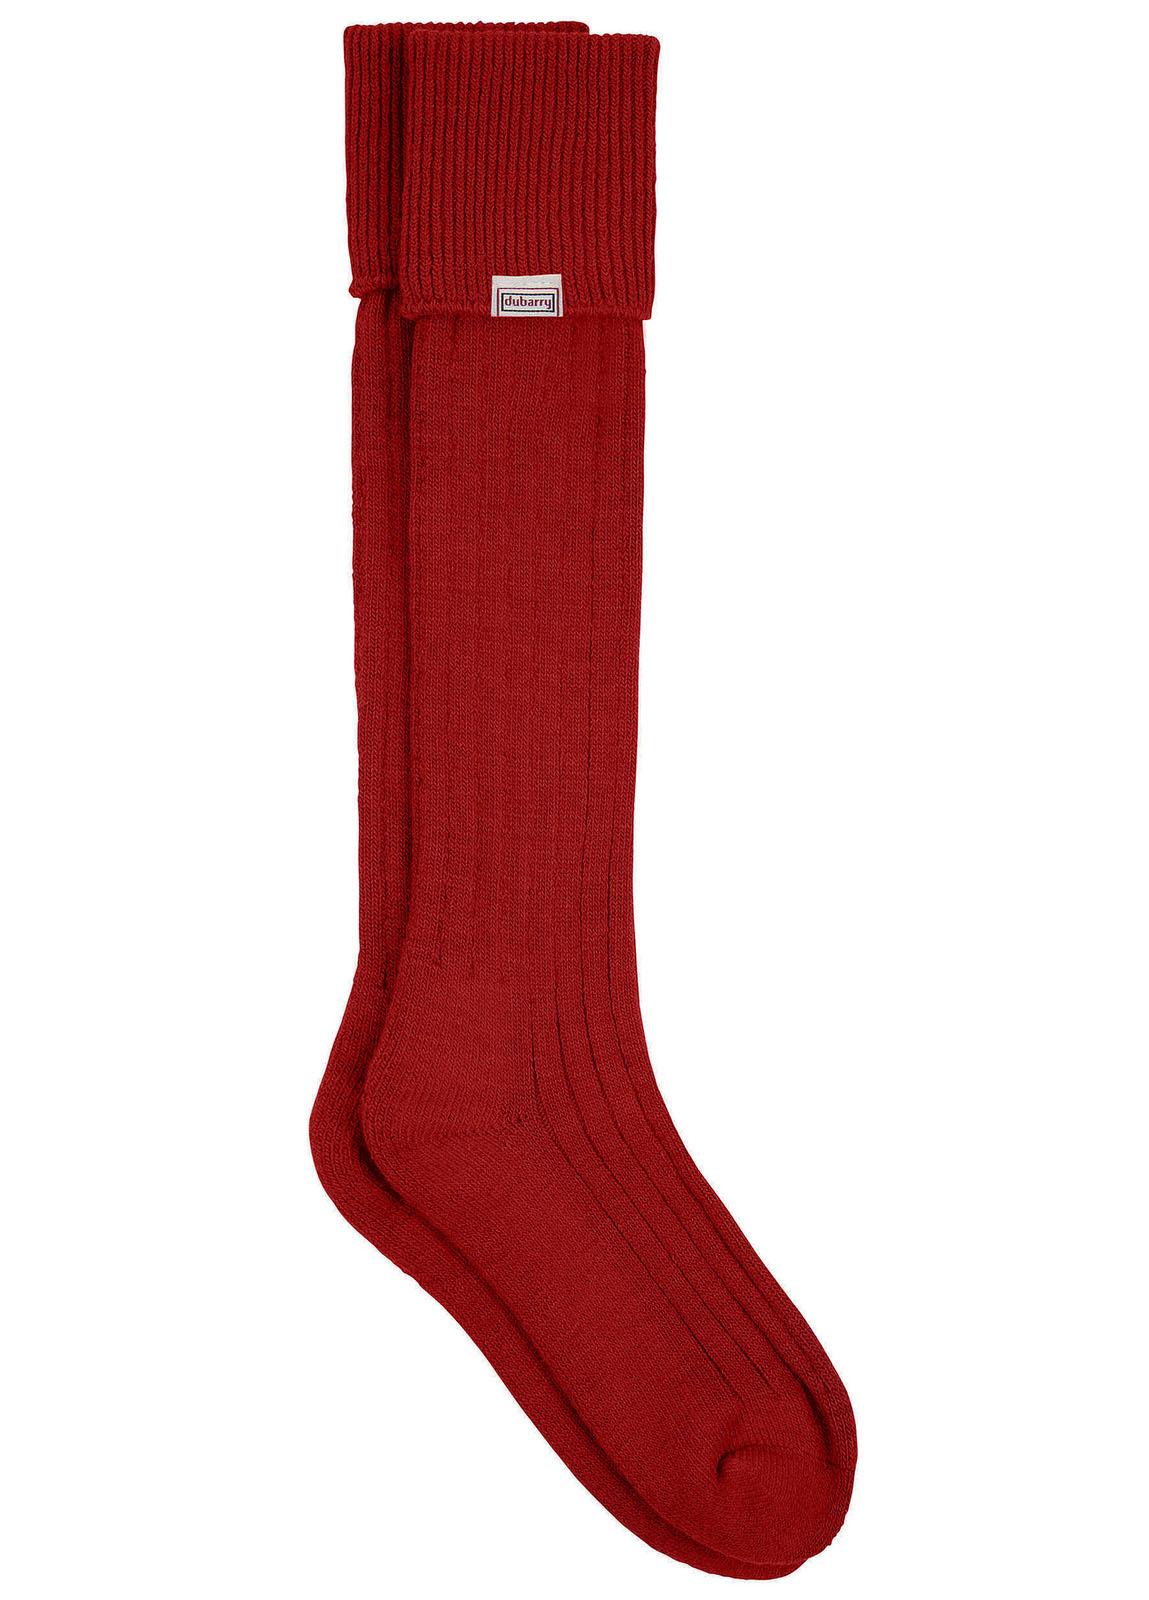 Alpaca_Socks_Cardinal_Image_1